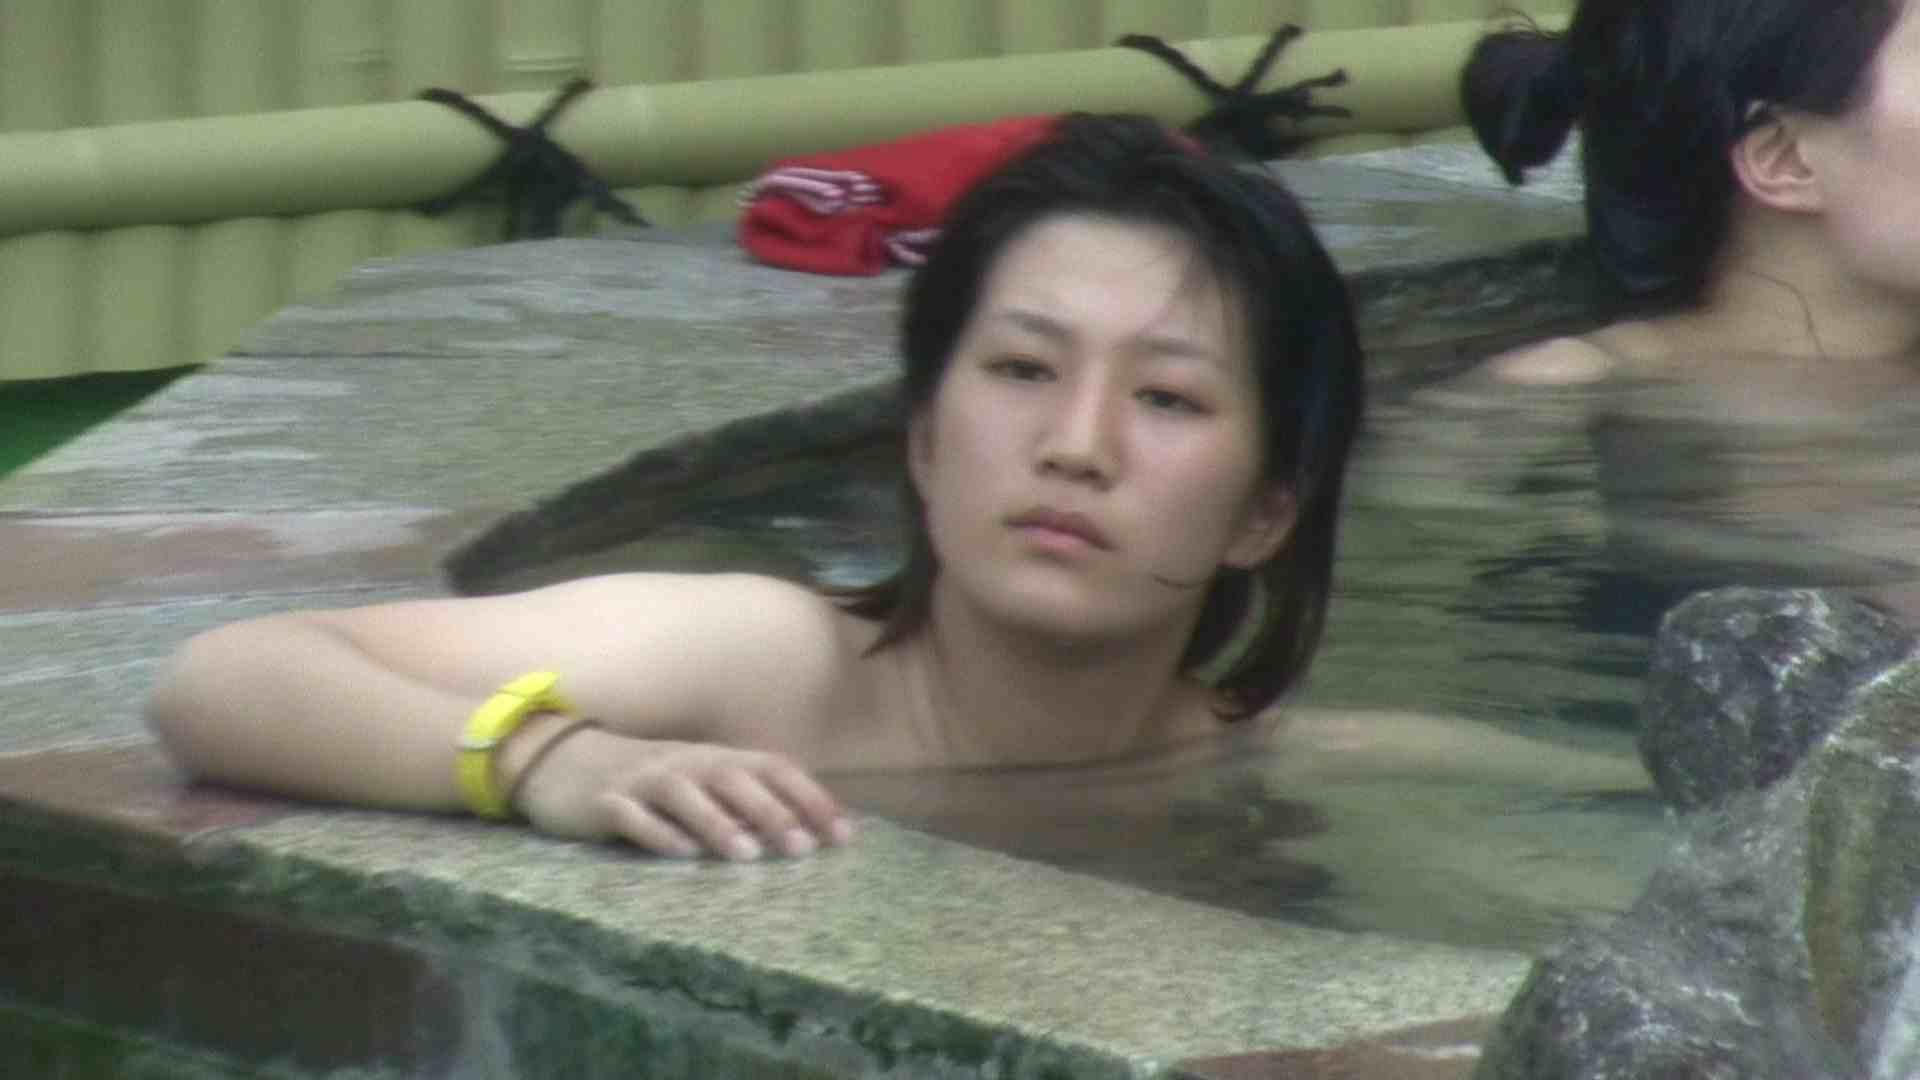 Aquaな露天風呂Vol.132 露天風呂編 | 盗撮シリーズ  78PIX 25